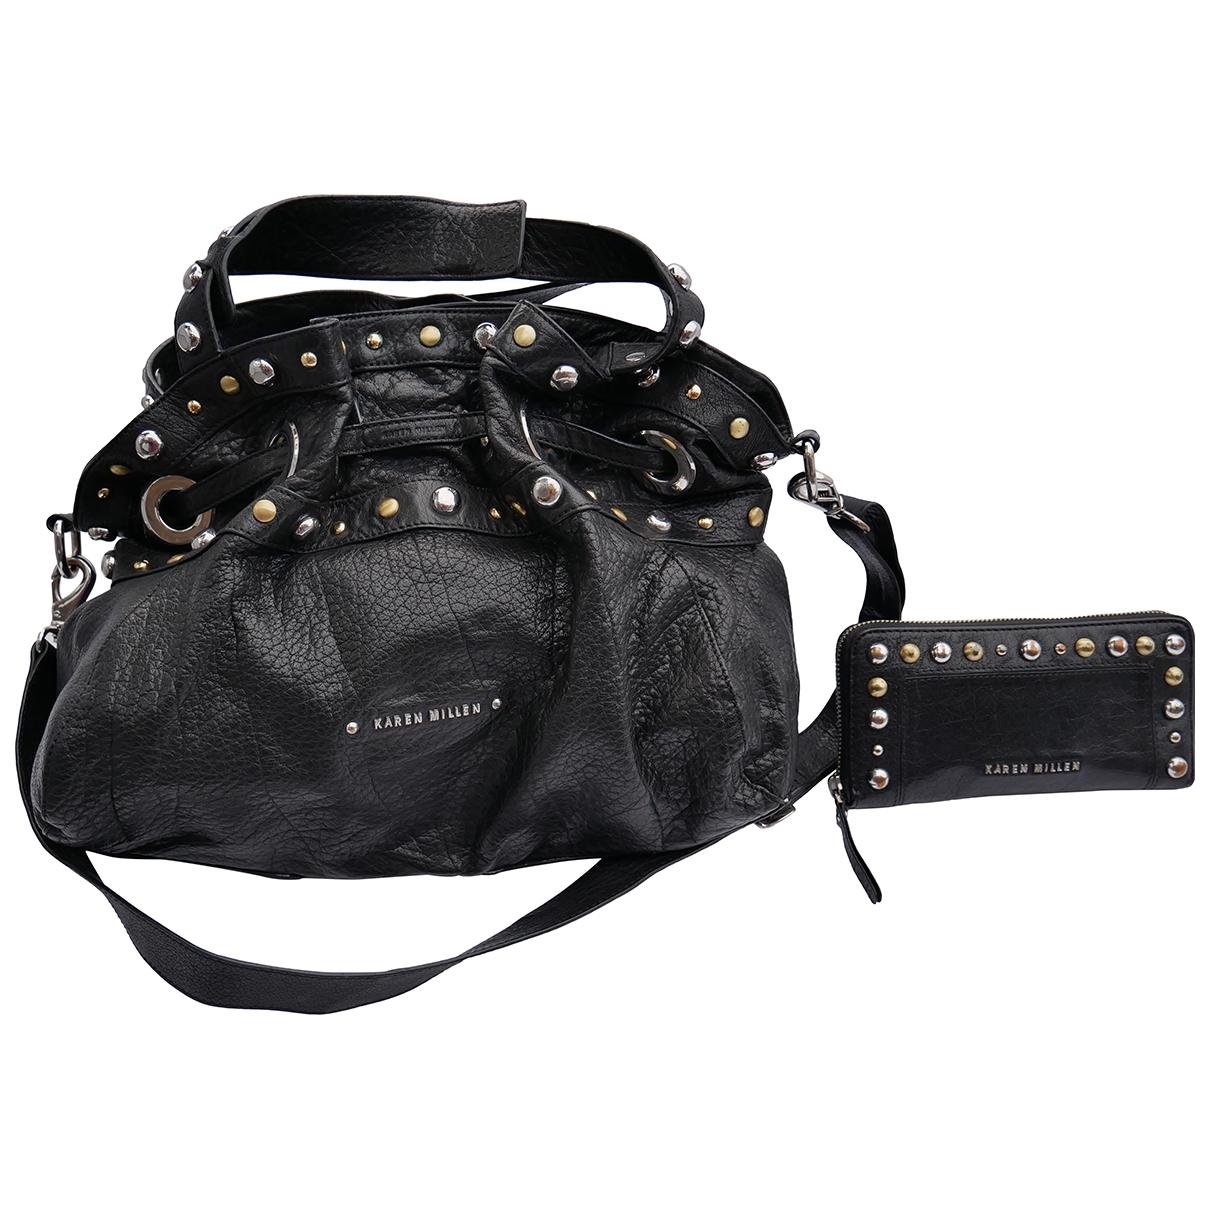 Karen Millen \N Handtasche in  Schwarz Leder